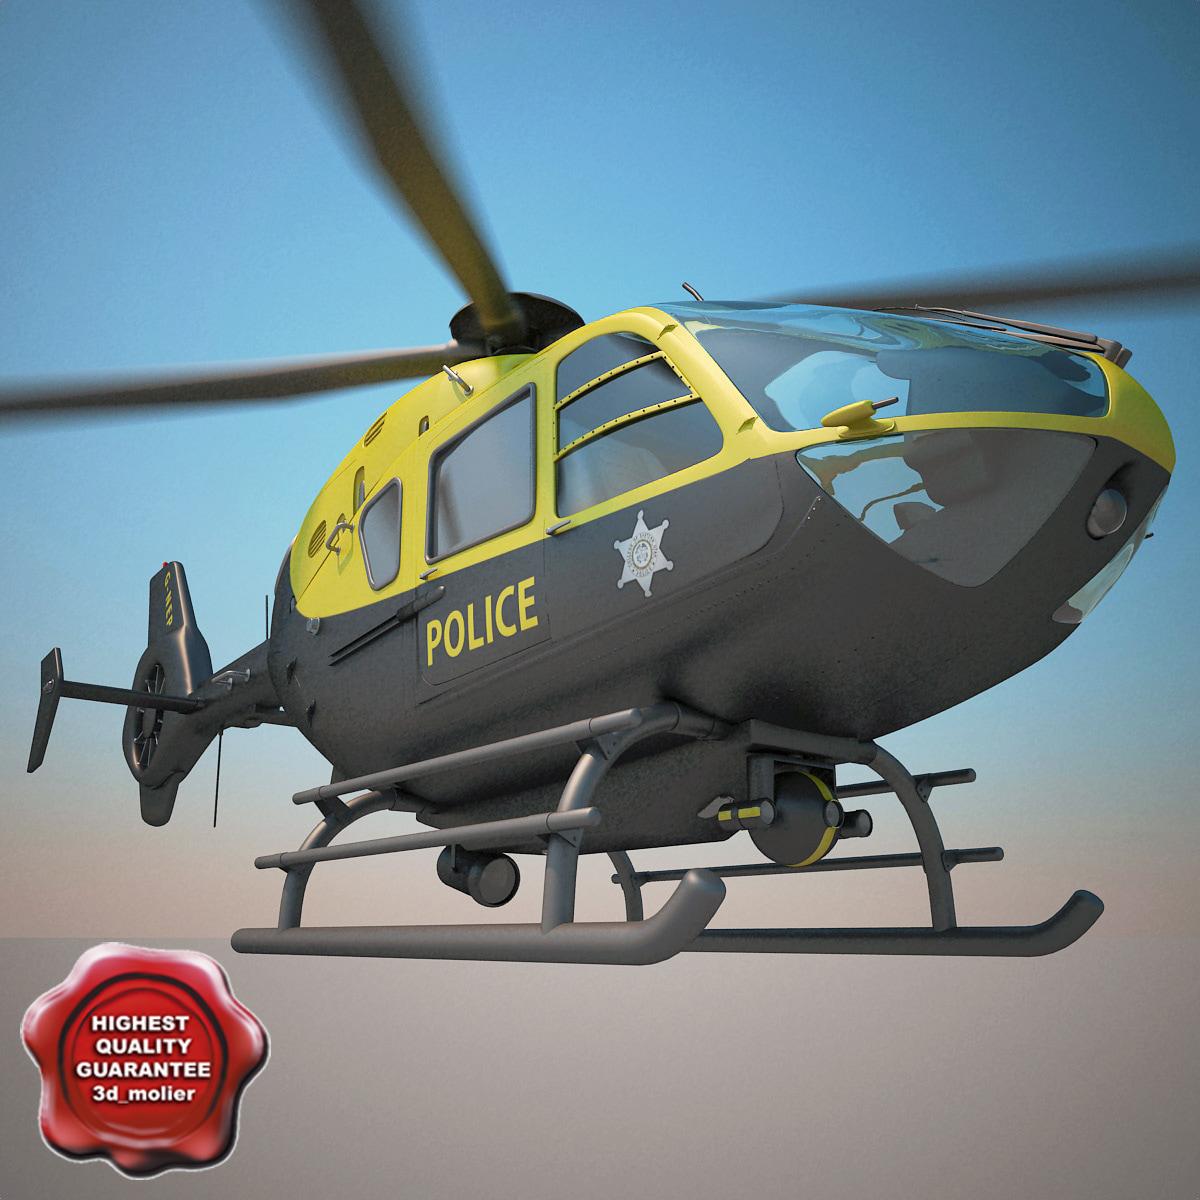 Eurocopter_EC-135_Police_00.jpg